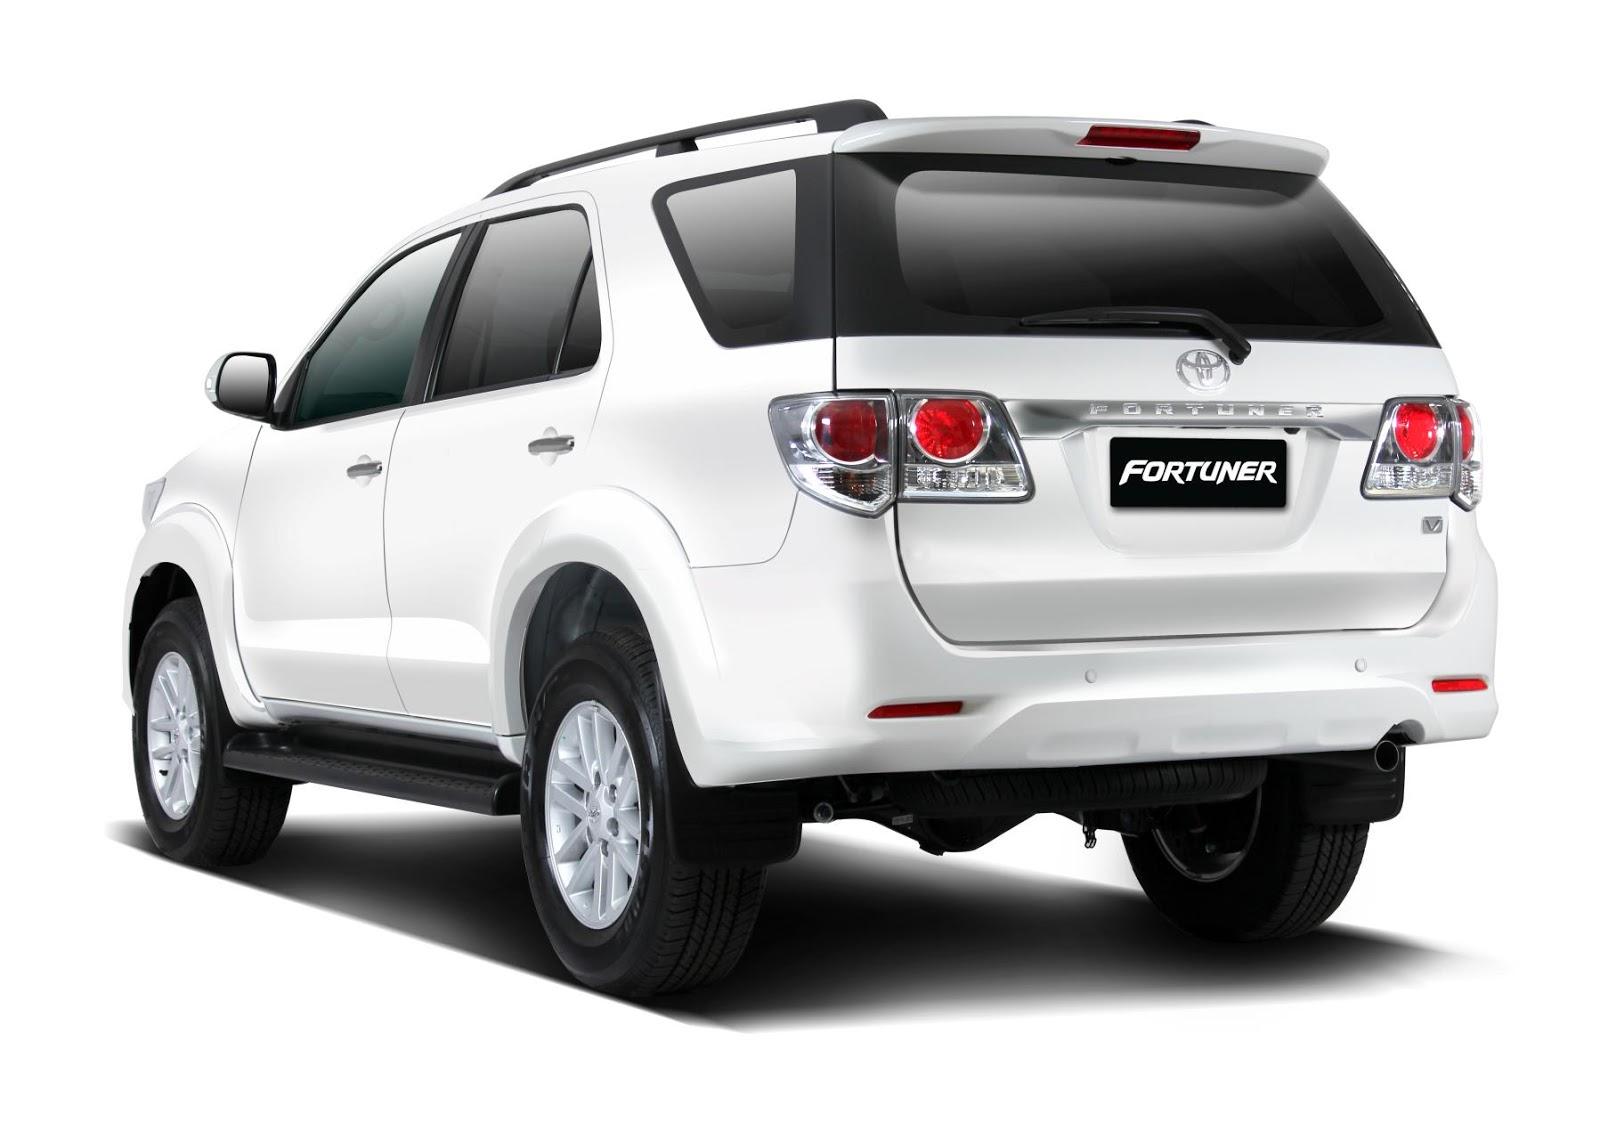 Fitur Grand New Veloz 1.3 Diskon All Kijang Innova Fortuner 2011 Dikta Toyota Informasi Produk Dan